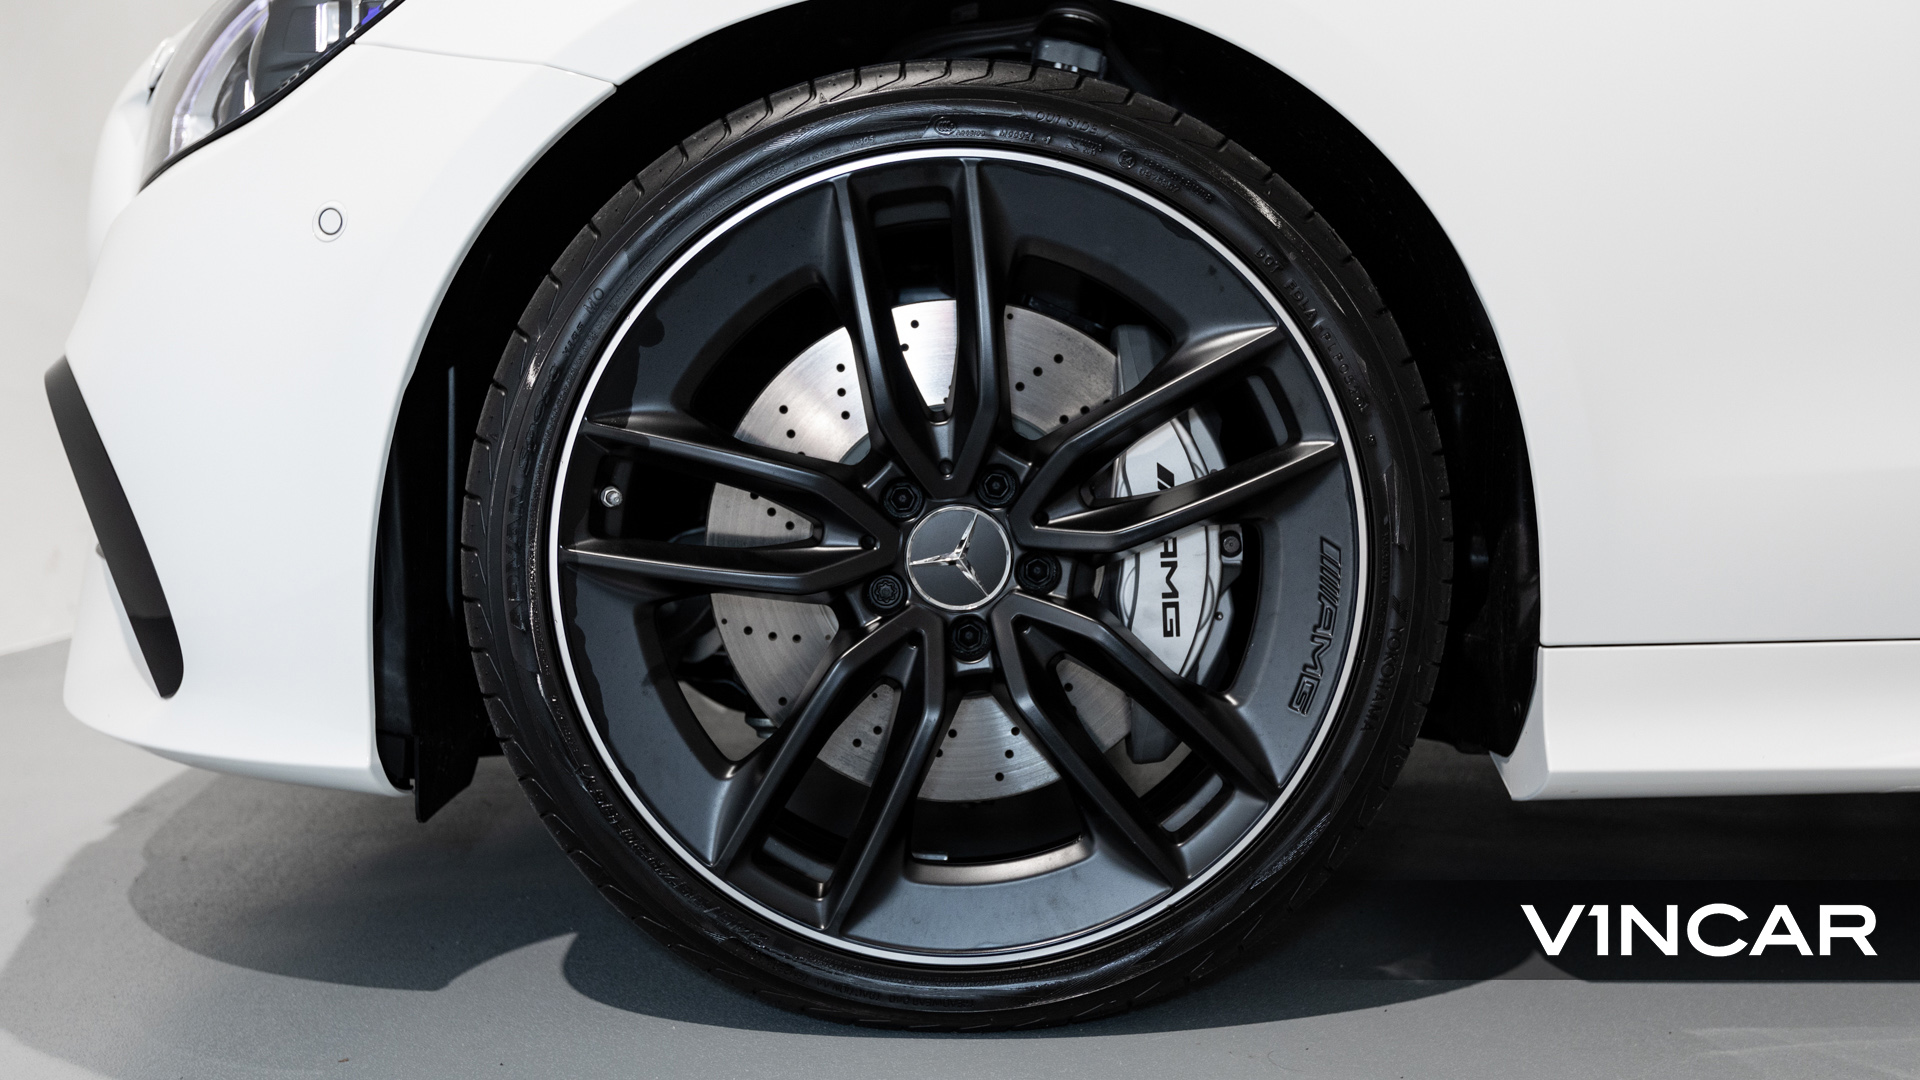 Mercedes-AMG E53 Coupe AMG Night Edition Premium Plus (FL2021) - Wheels